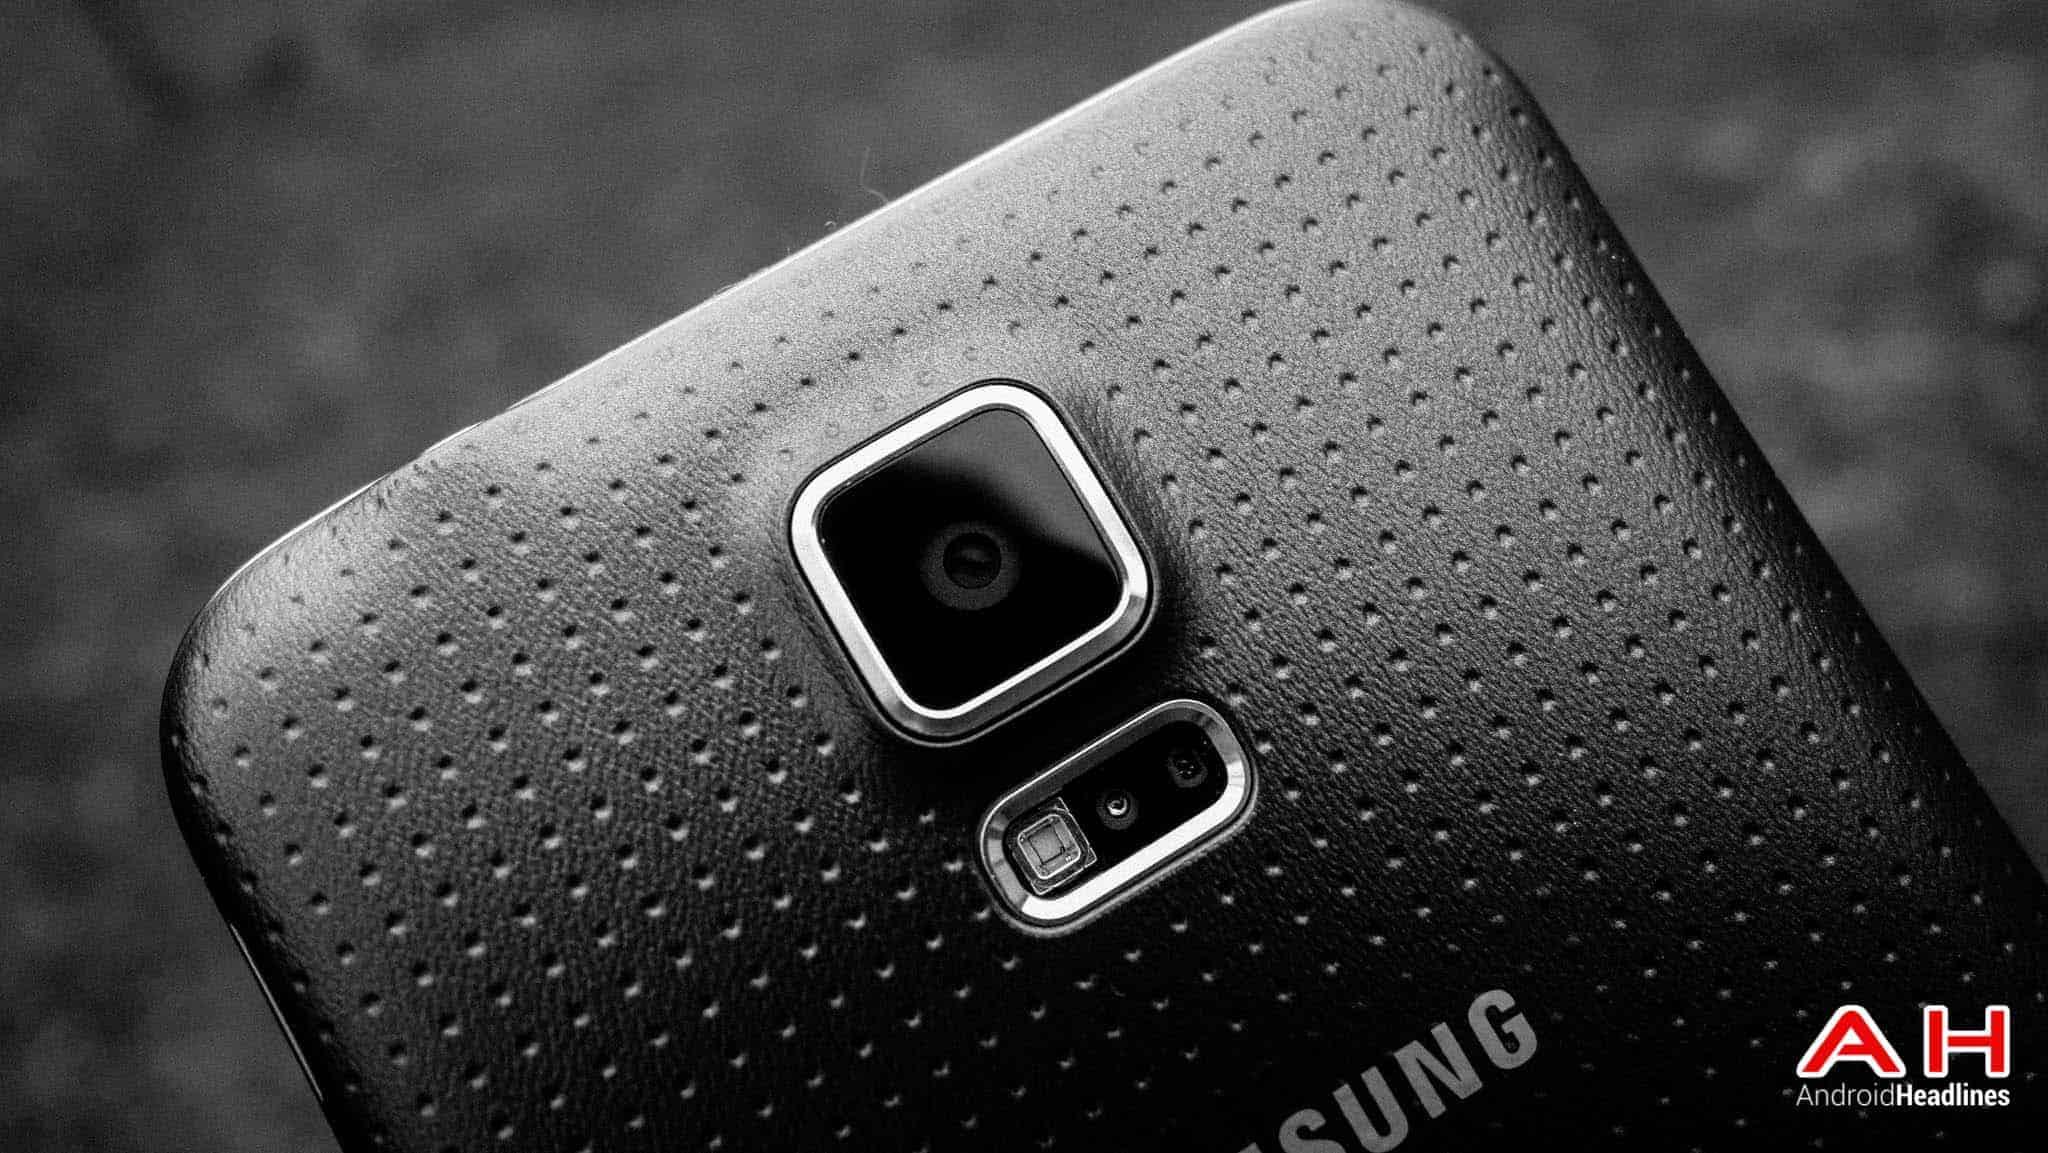 Samsung-galaxy-s5-ah-7-2